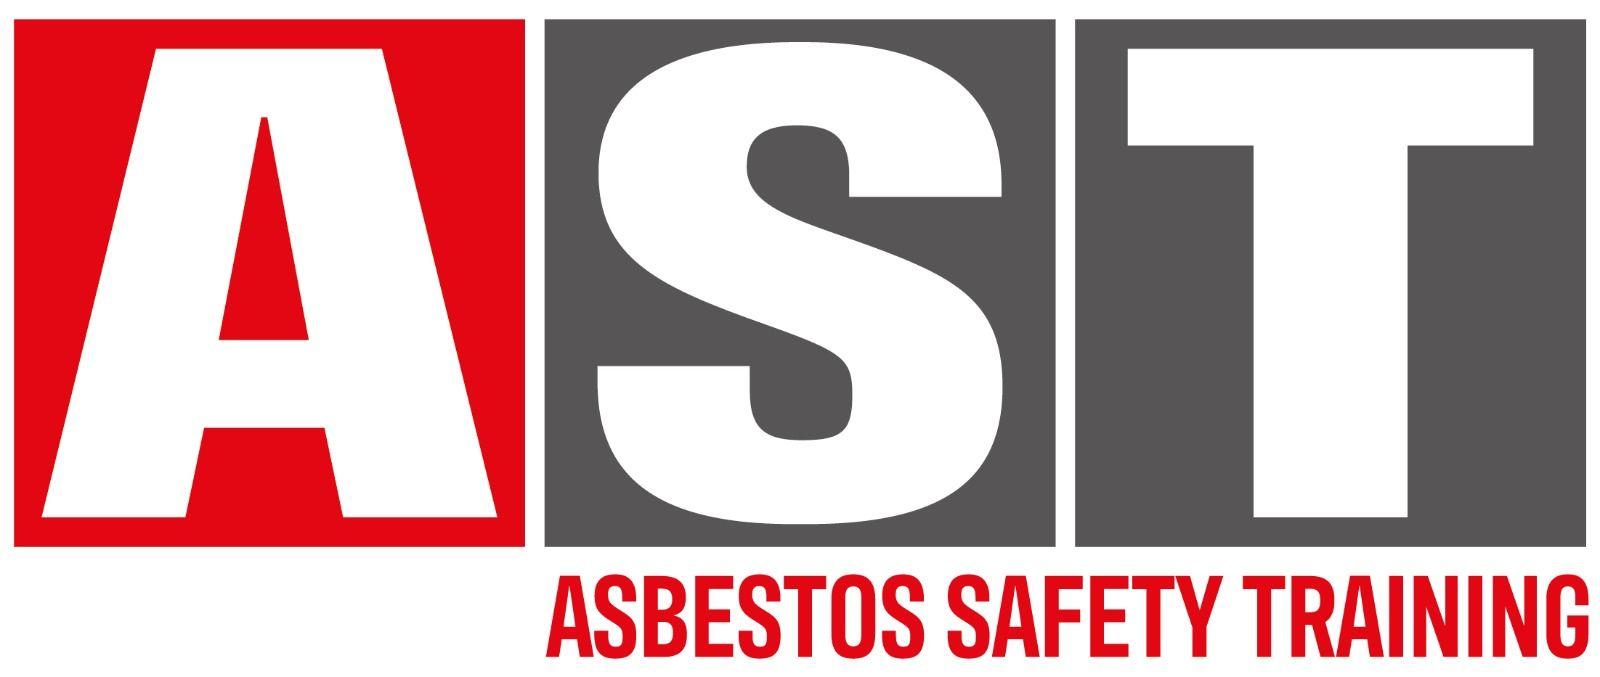 Asbestos Safety Training